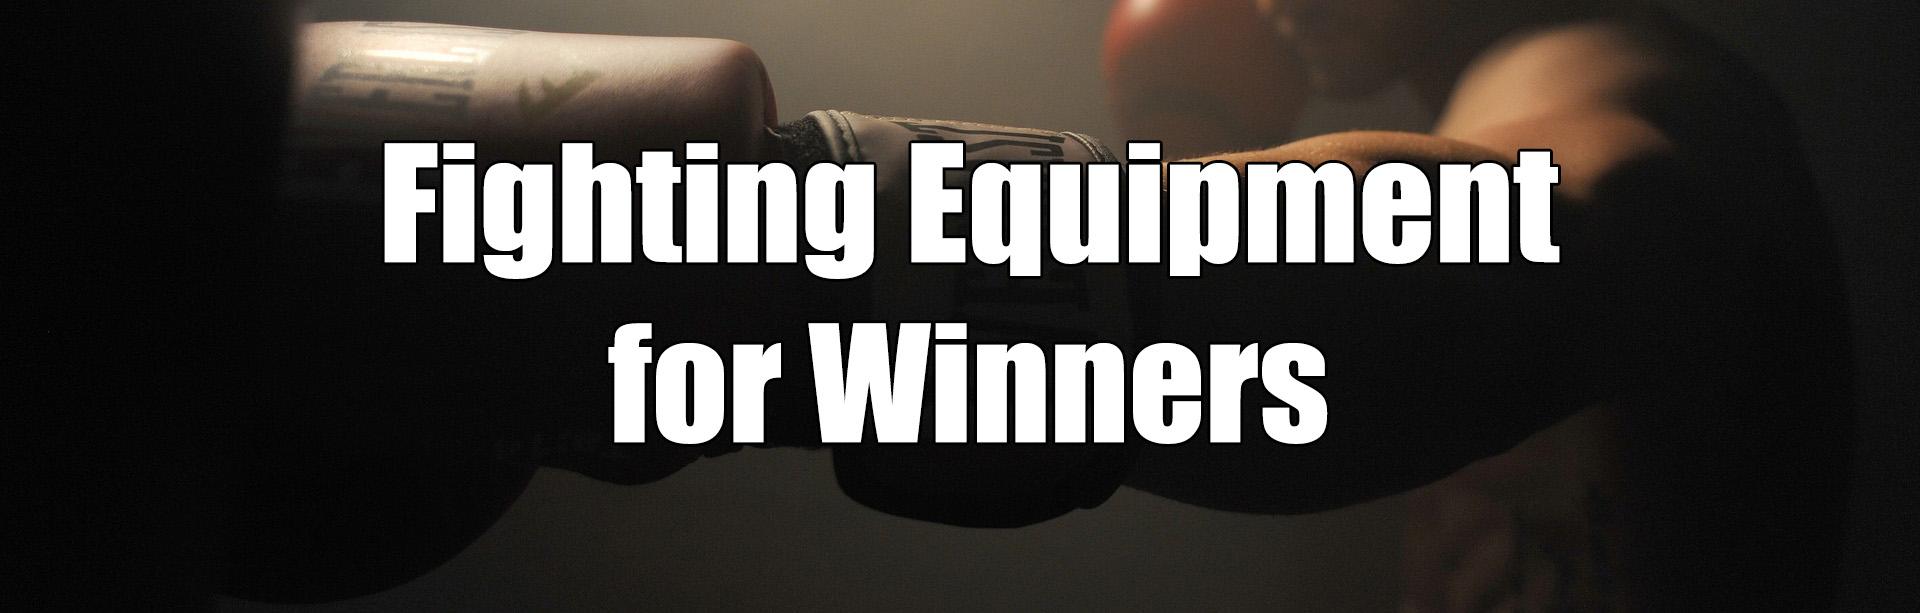 Fighting Equipment - FighterCulture